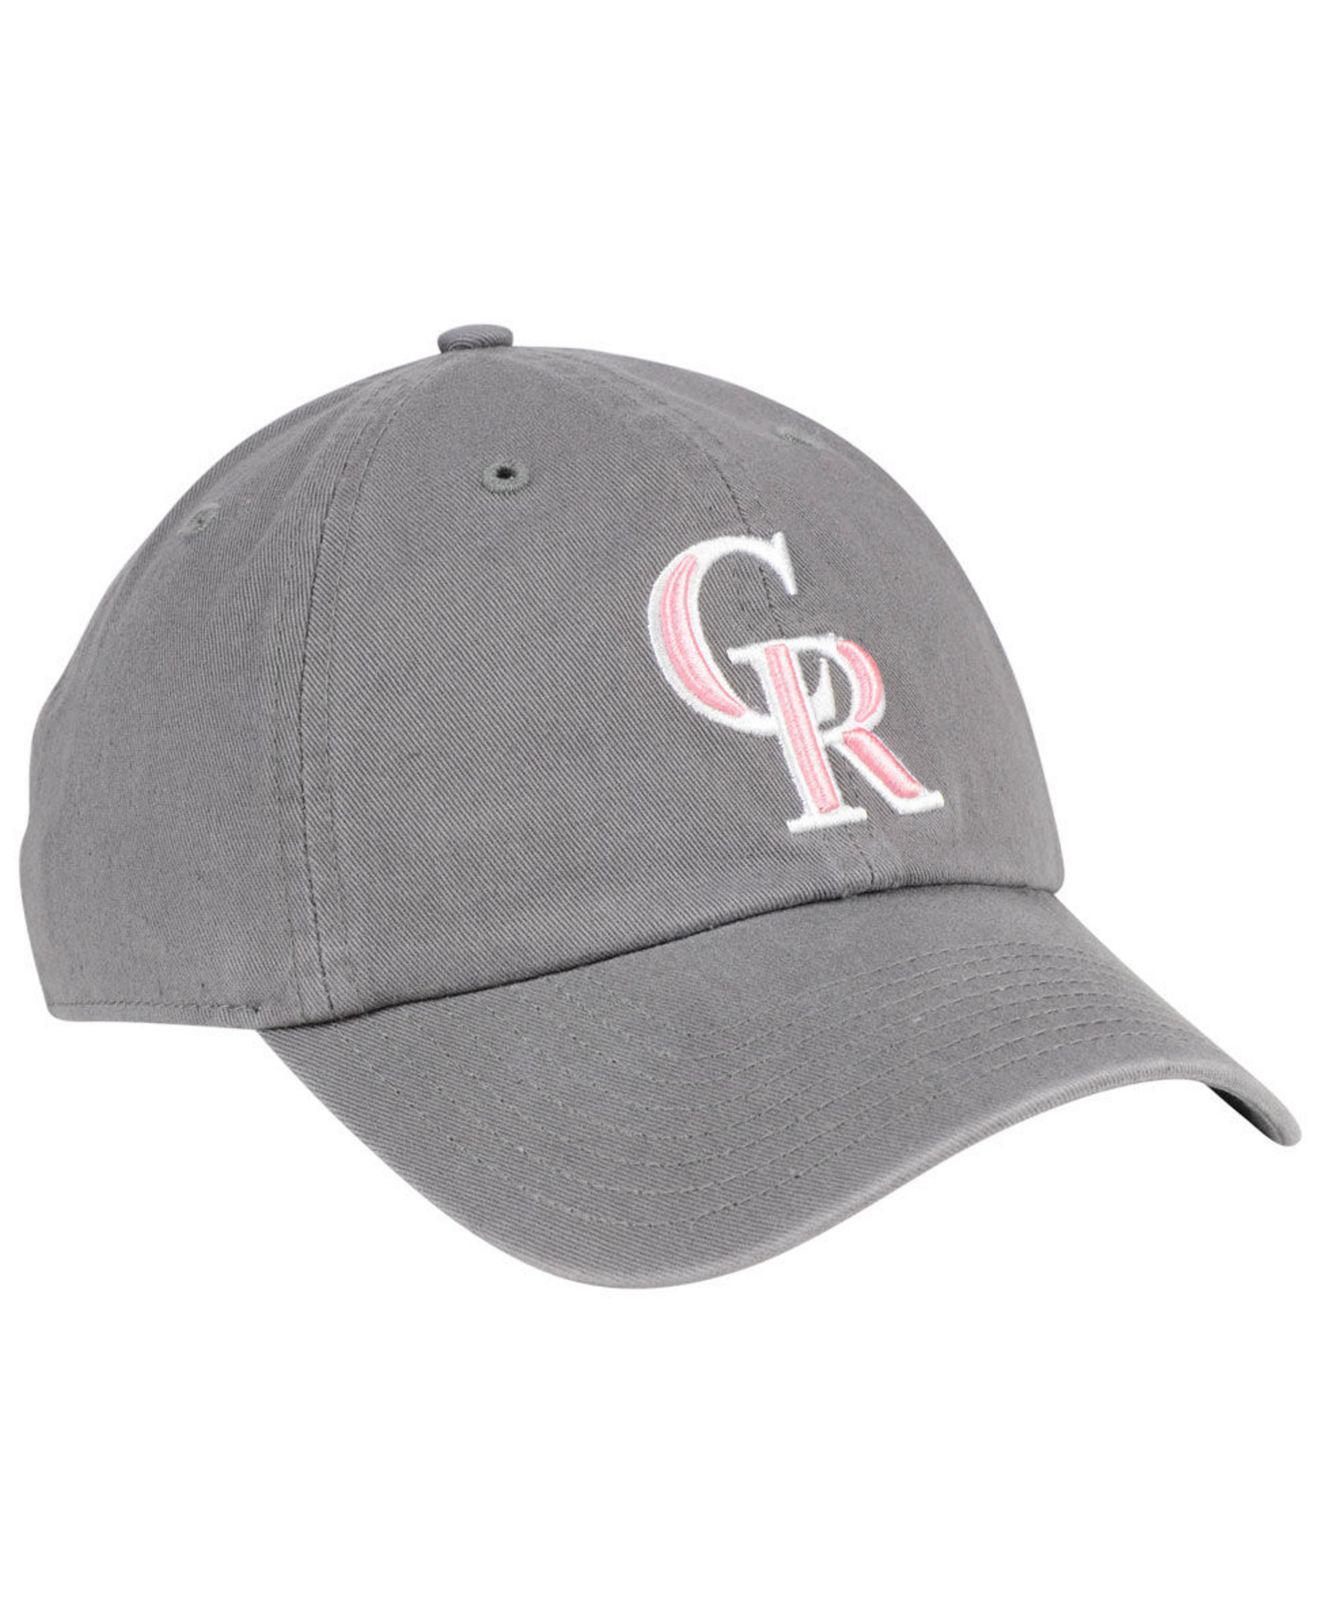 check out 7e5d9 6c823 ... white 47 clean up cap f90d5 47e6f  official detroit tigers 47 mlb dark  gray pink 47 brand colorado rockies dark gray pink clean